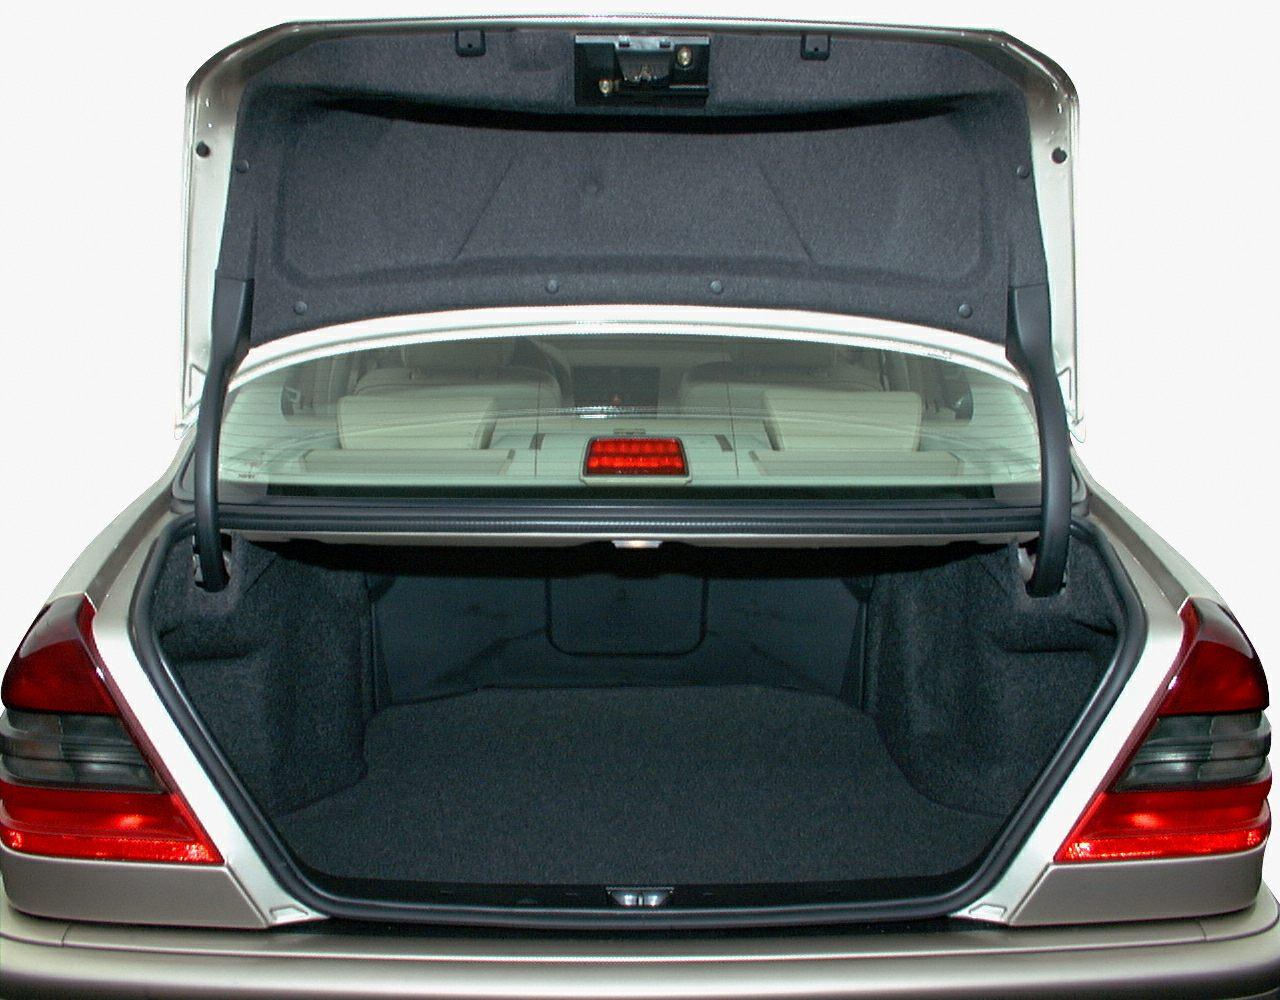 2000 Mercedes Benz C Class Exterior Photo